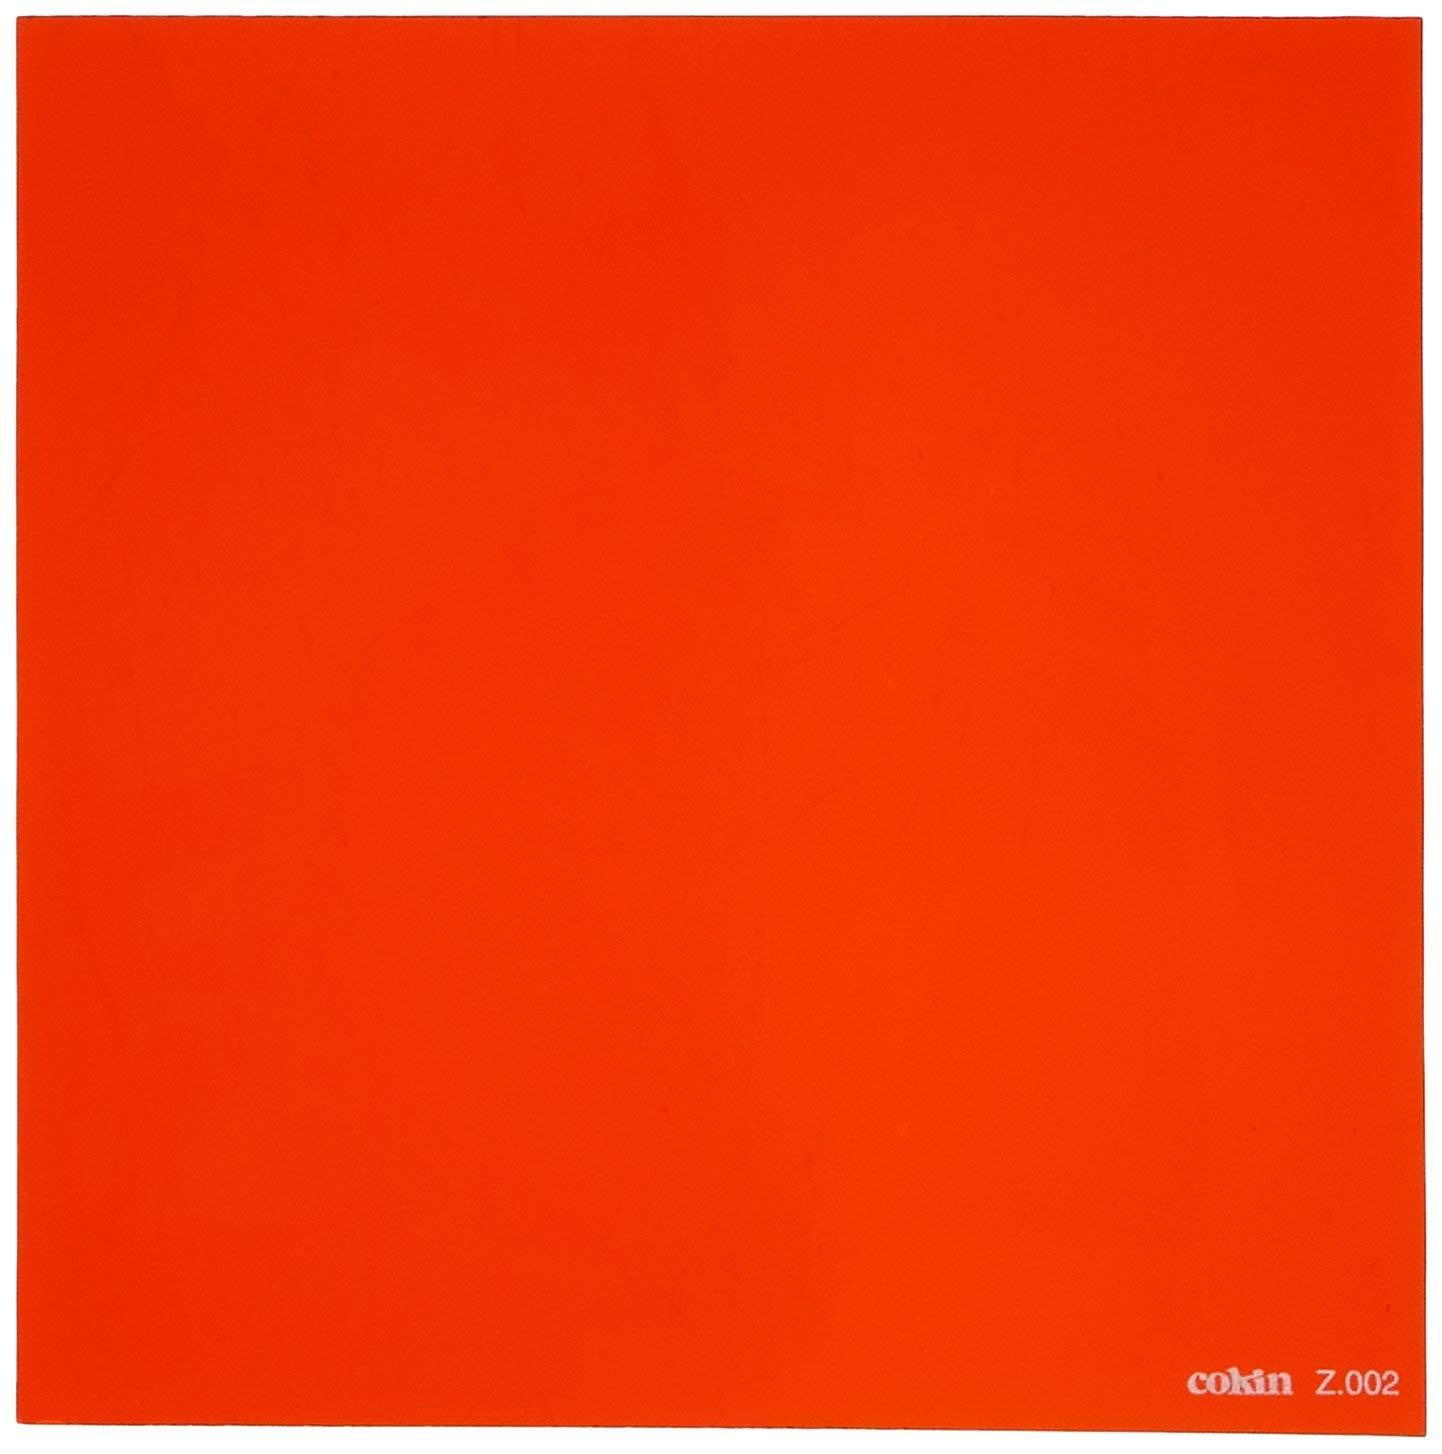 Cokin Square Orange (Z002) - 2/3-Stop for L (Z) Series Holder - 100mm X 100mm by Cokin